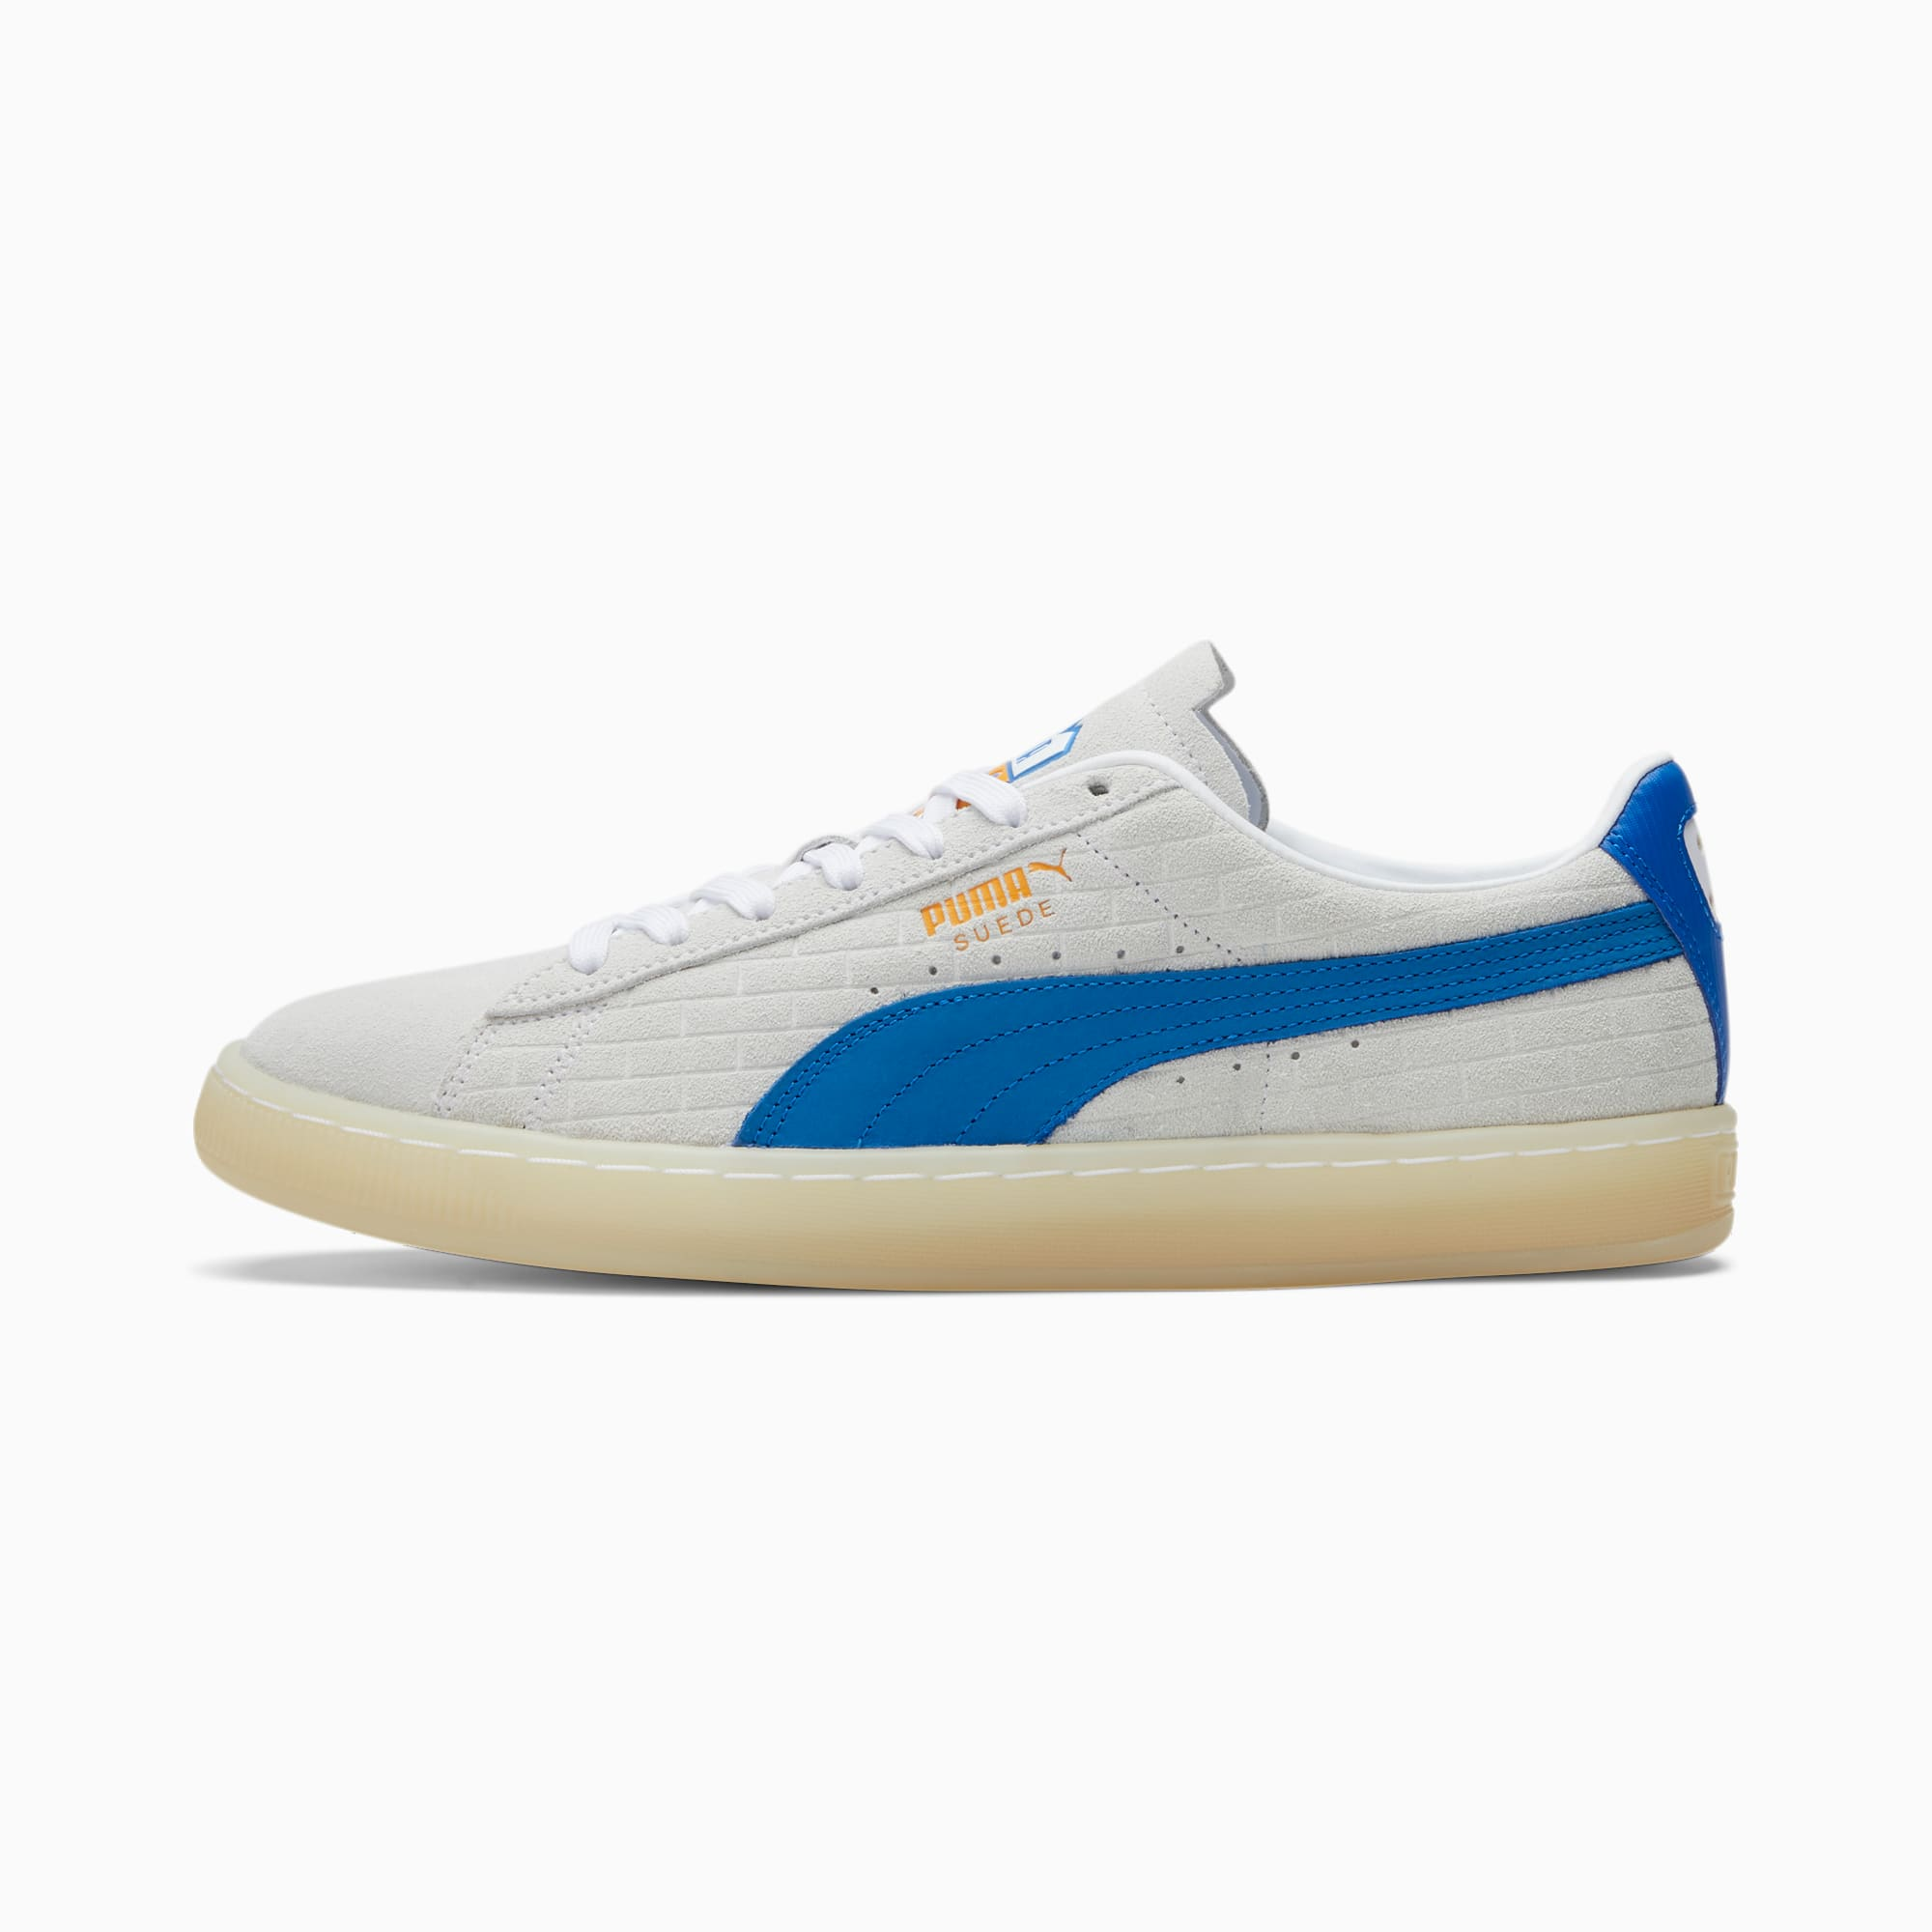 PUMA x WHITE CASTLE Men's Suede Sneakers